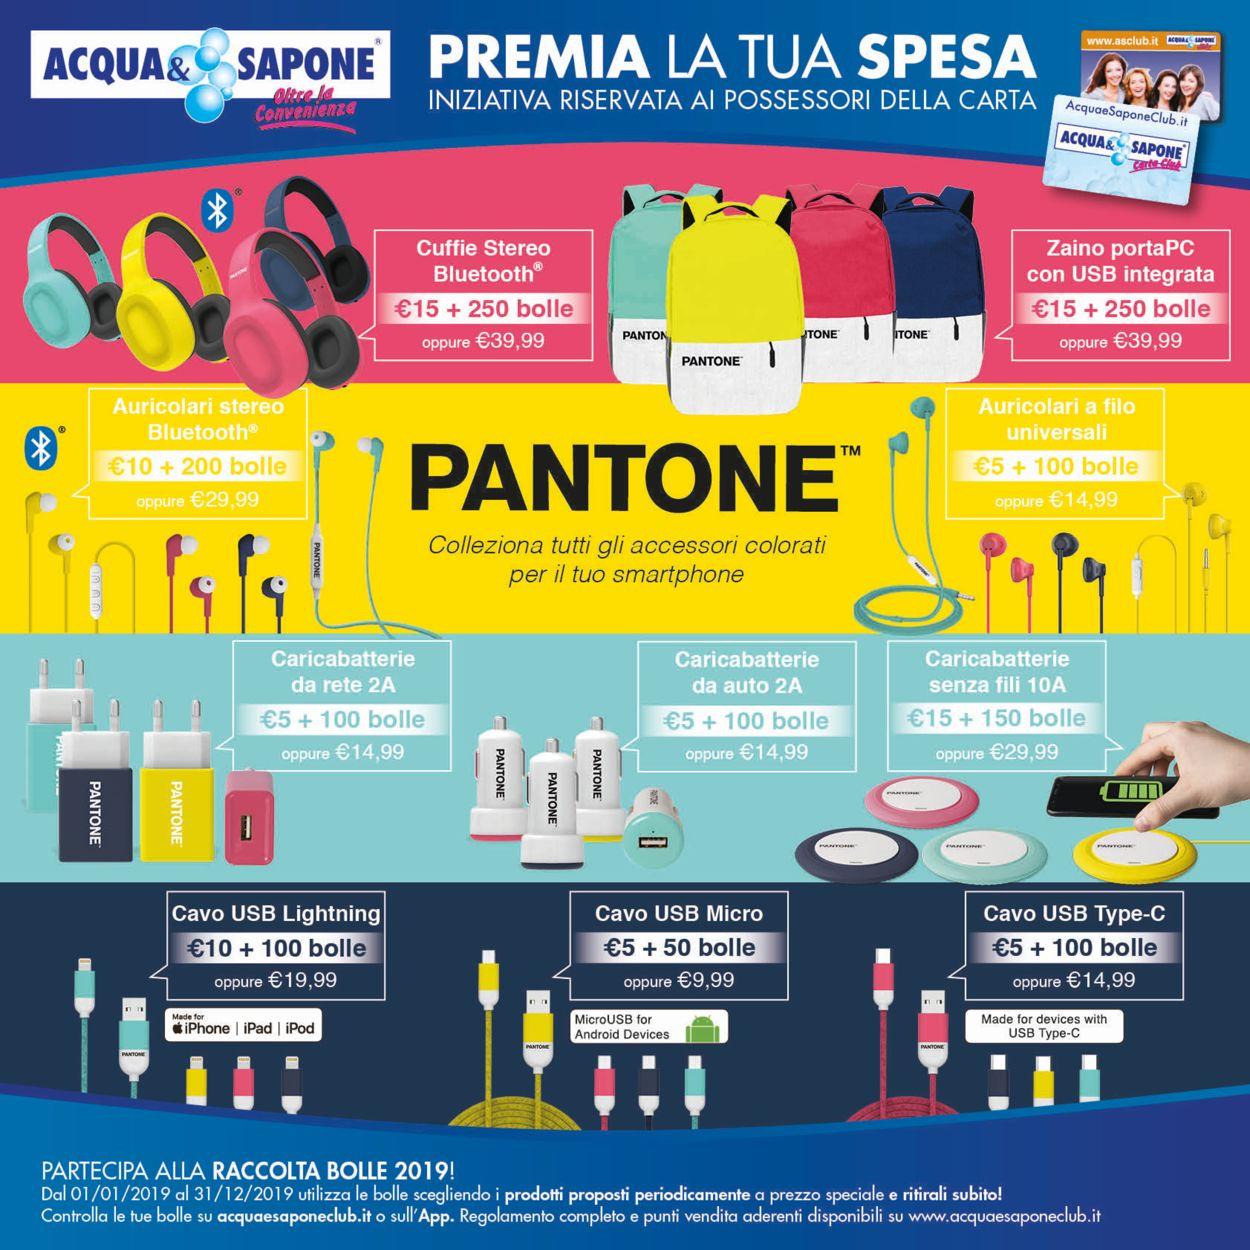 Volantino Acqua & Sapone - Offerte 28/05-09/06/2019